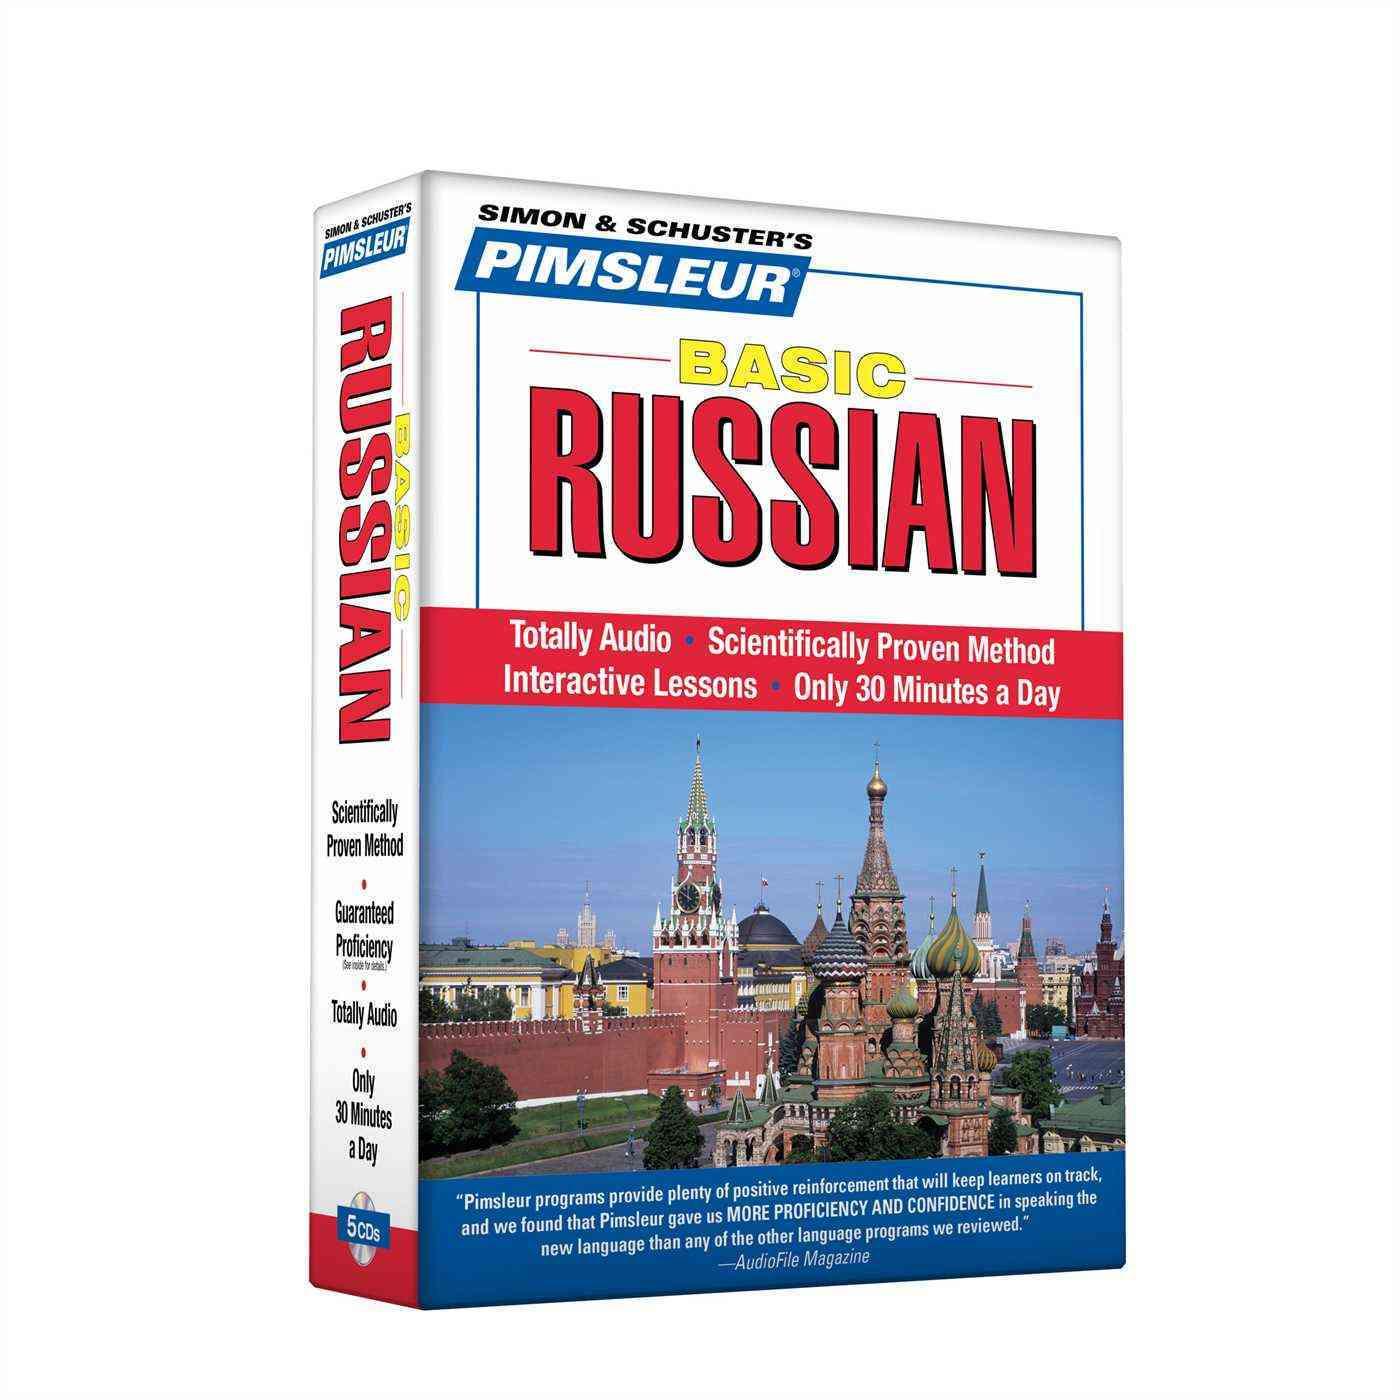 Pimsleur Basic Russian (CD-Audio)